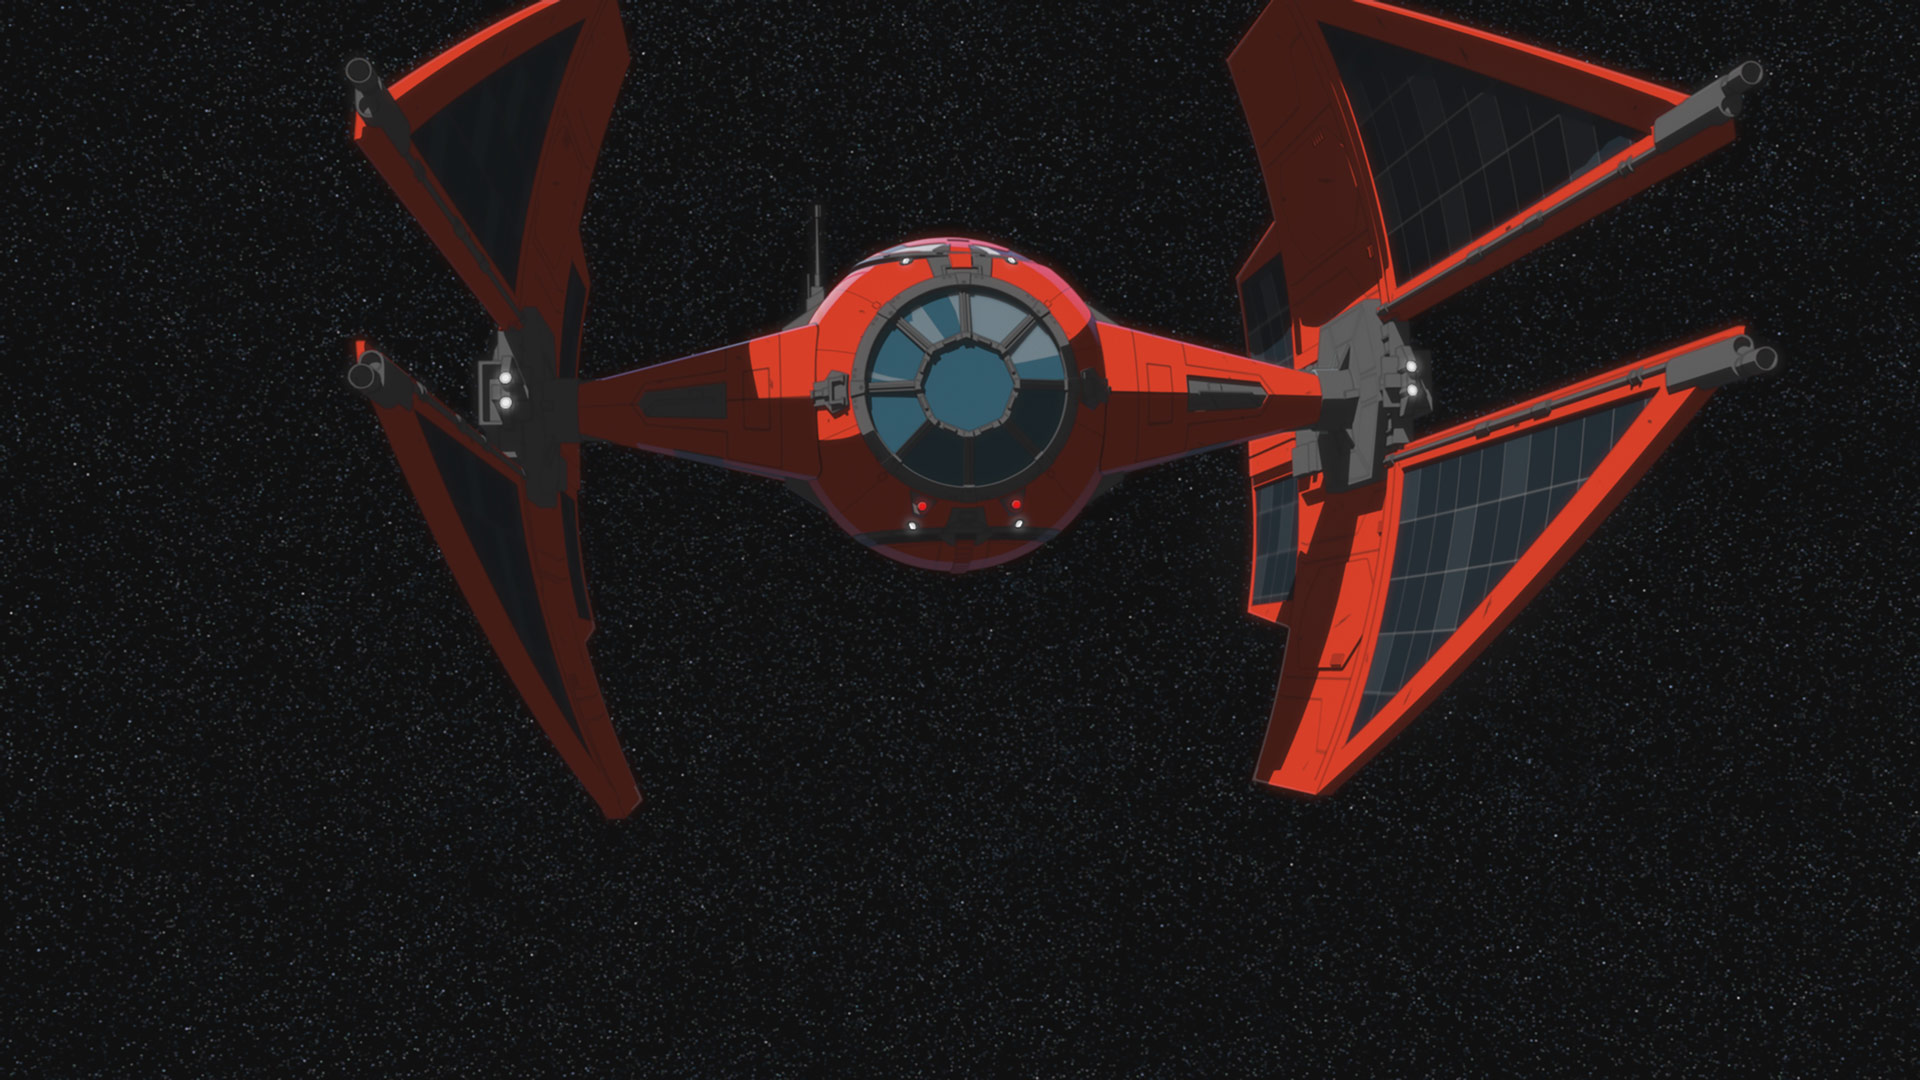 Tie Fighter Hyperdrive Resistance